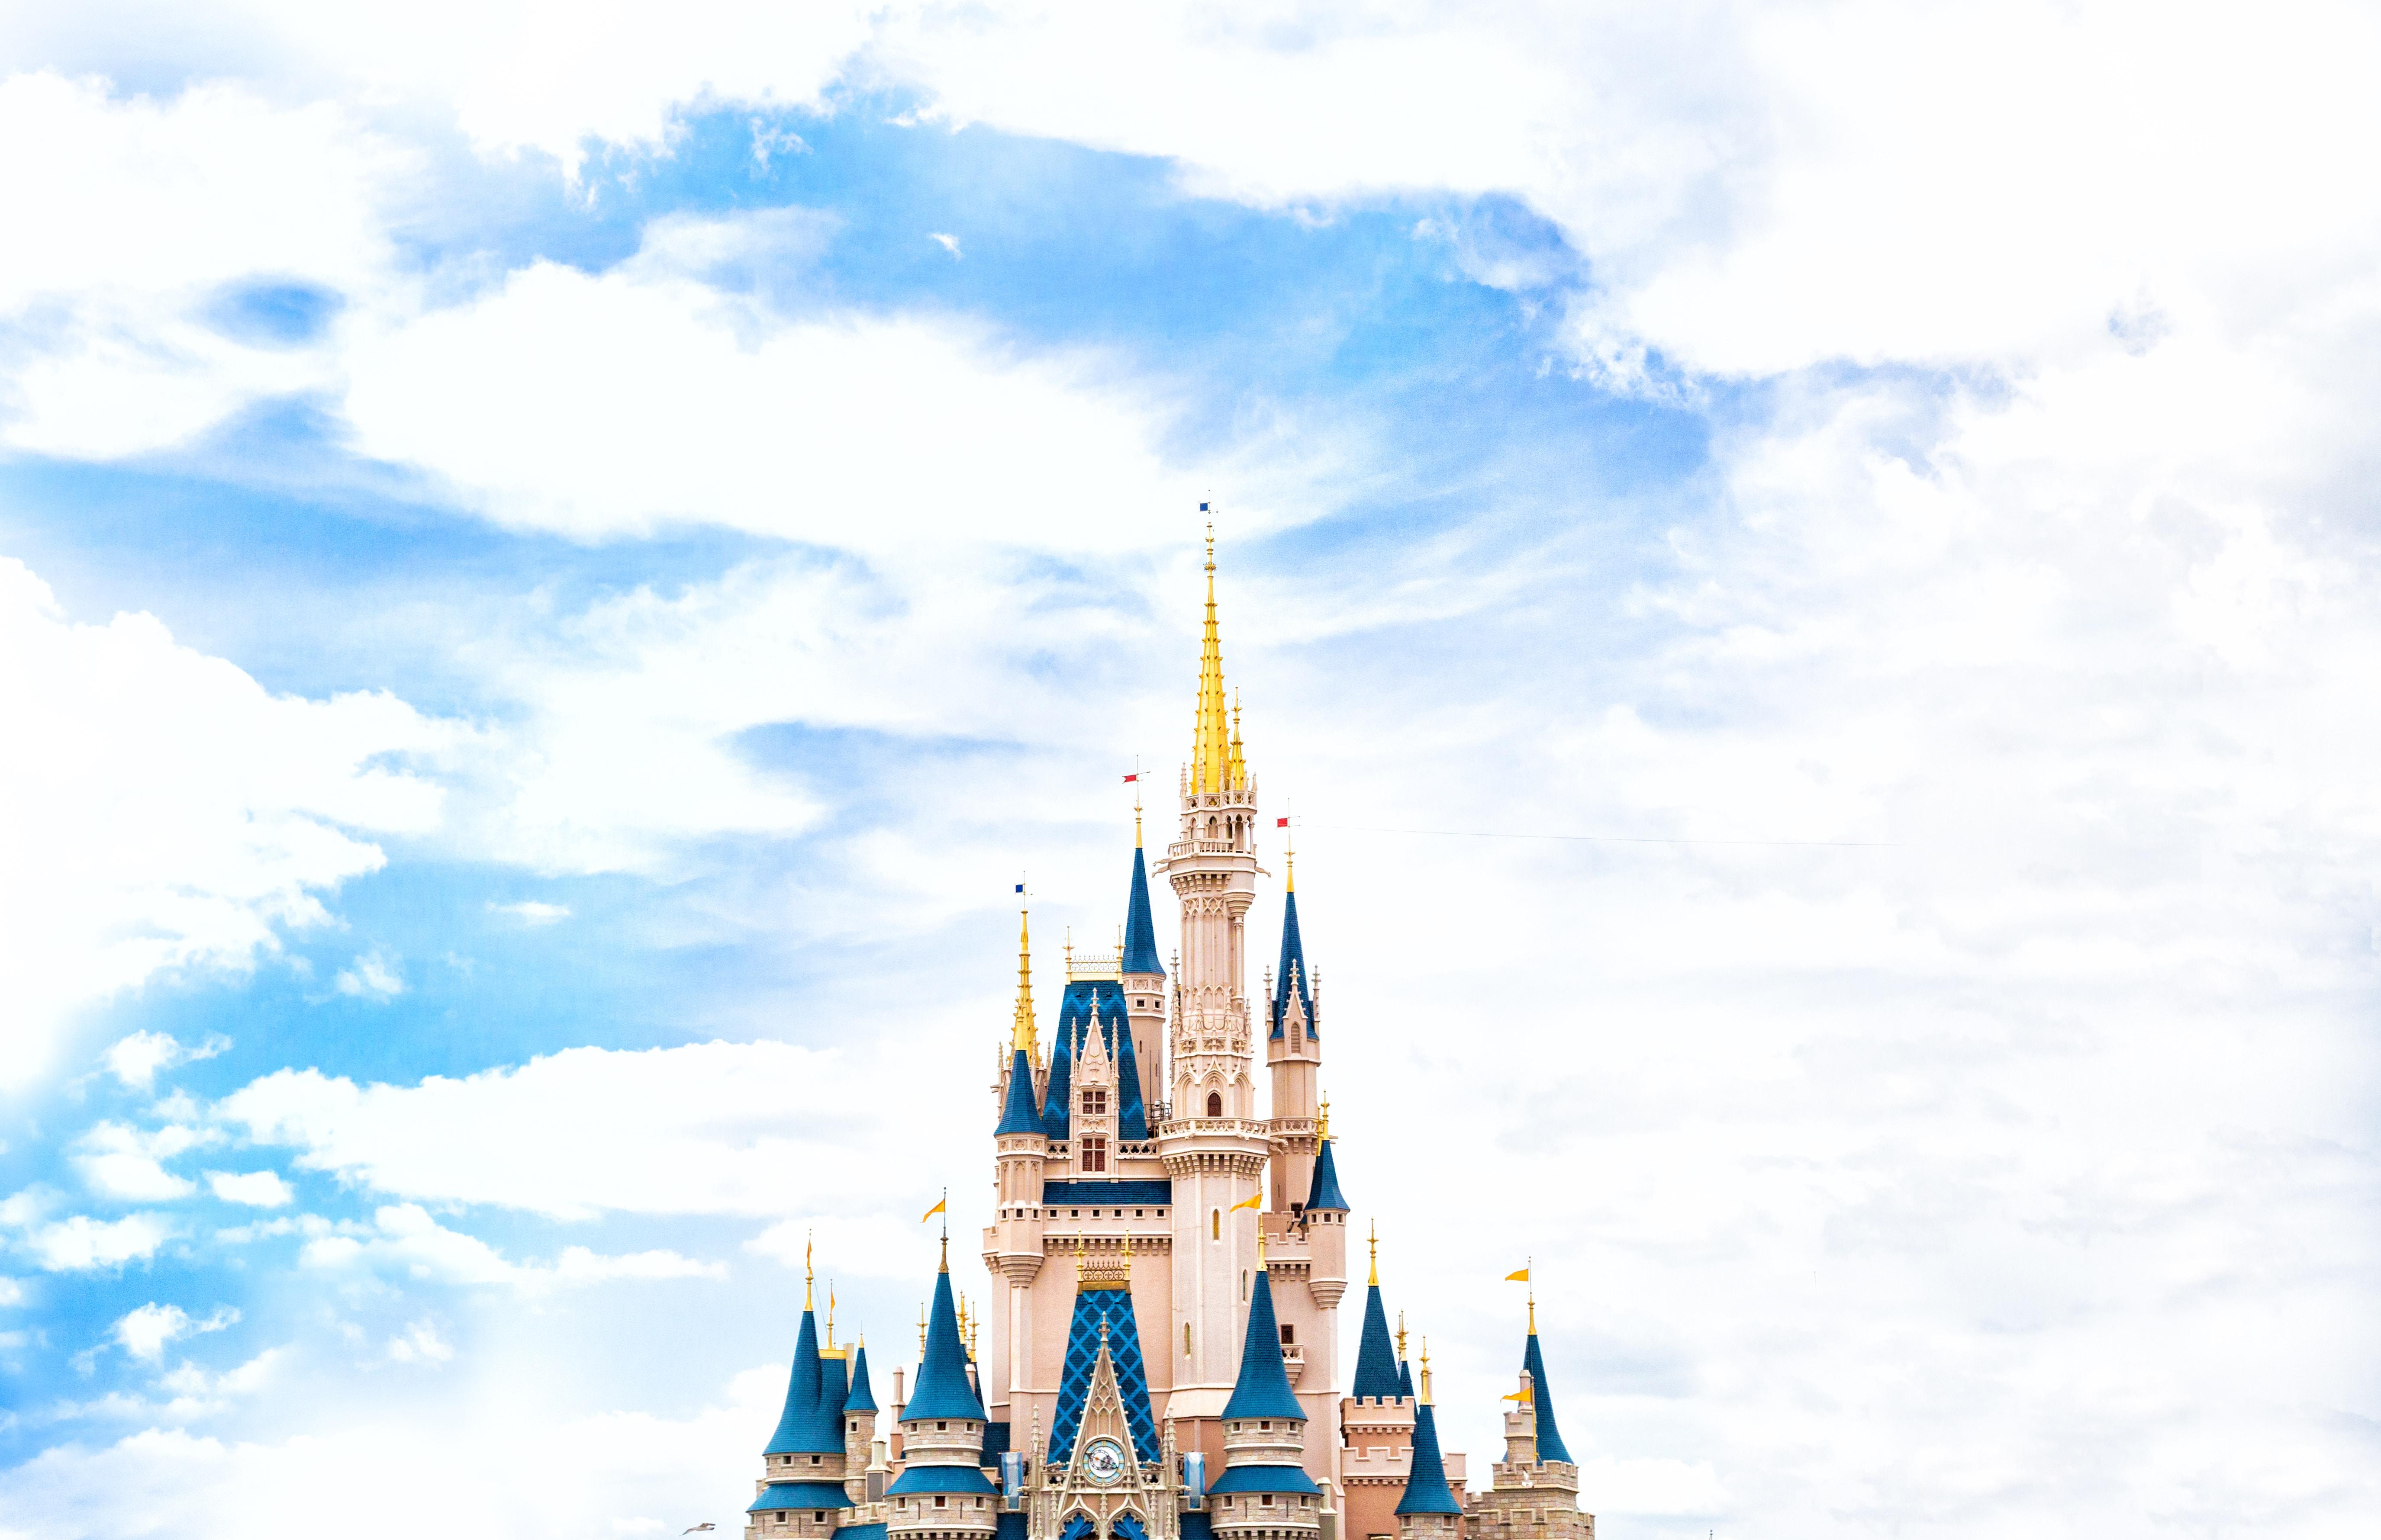 chateau disney ciel bleu